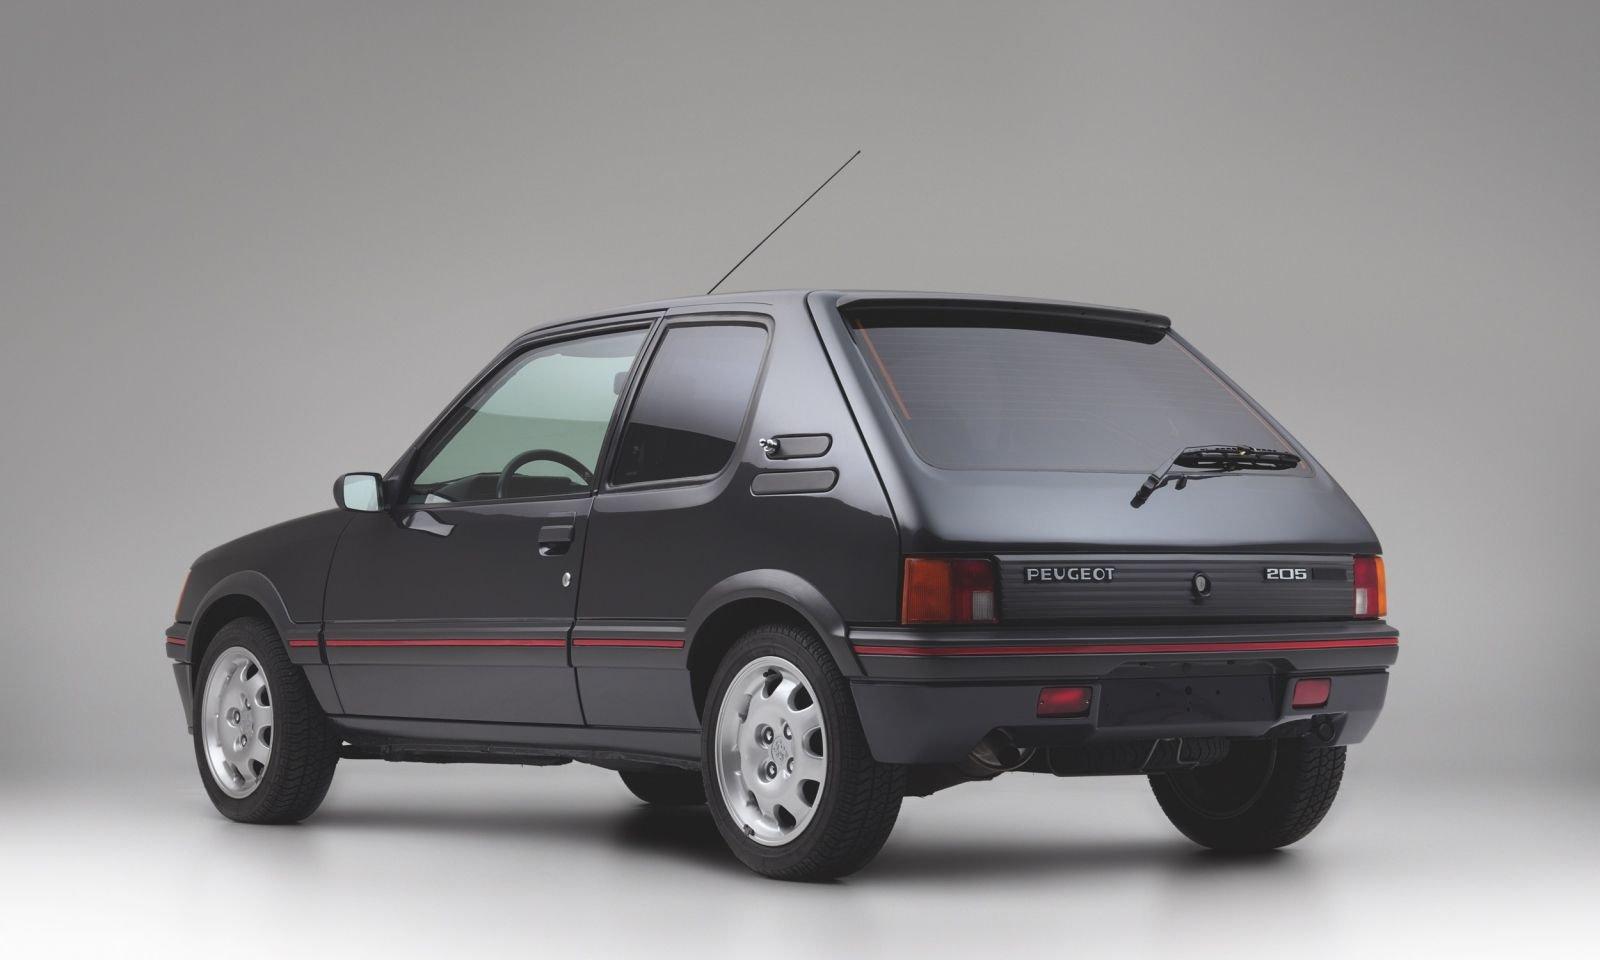 Peugeot-205-GTI-Armor-10